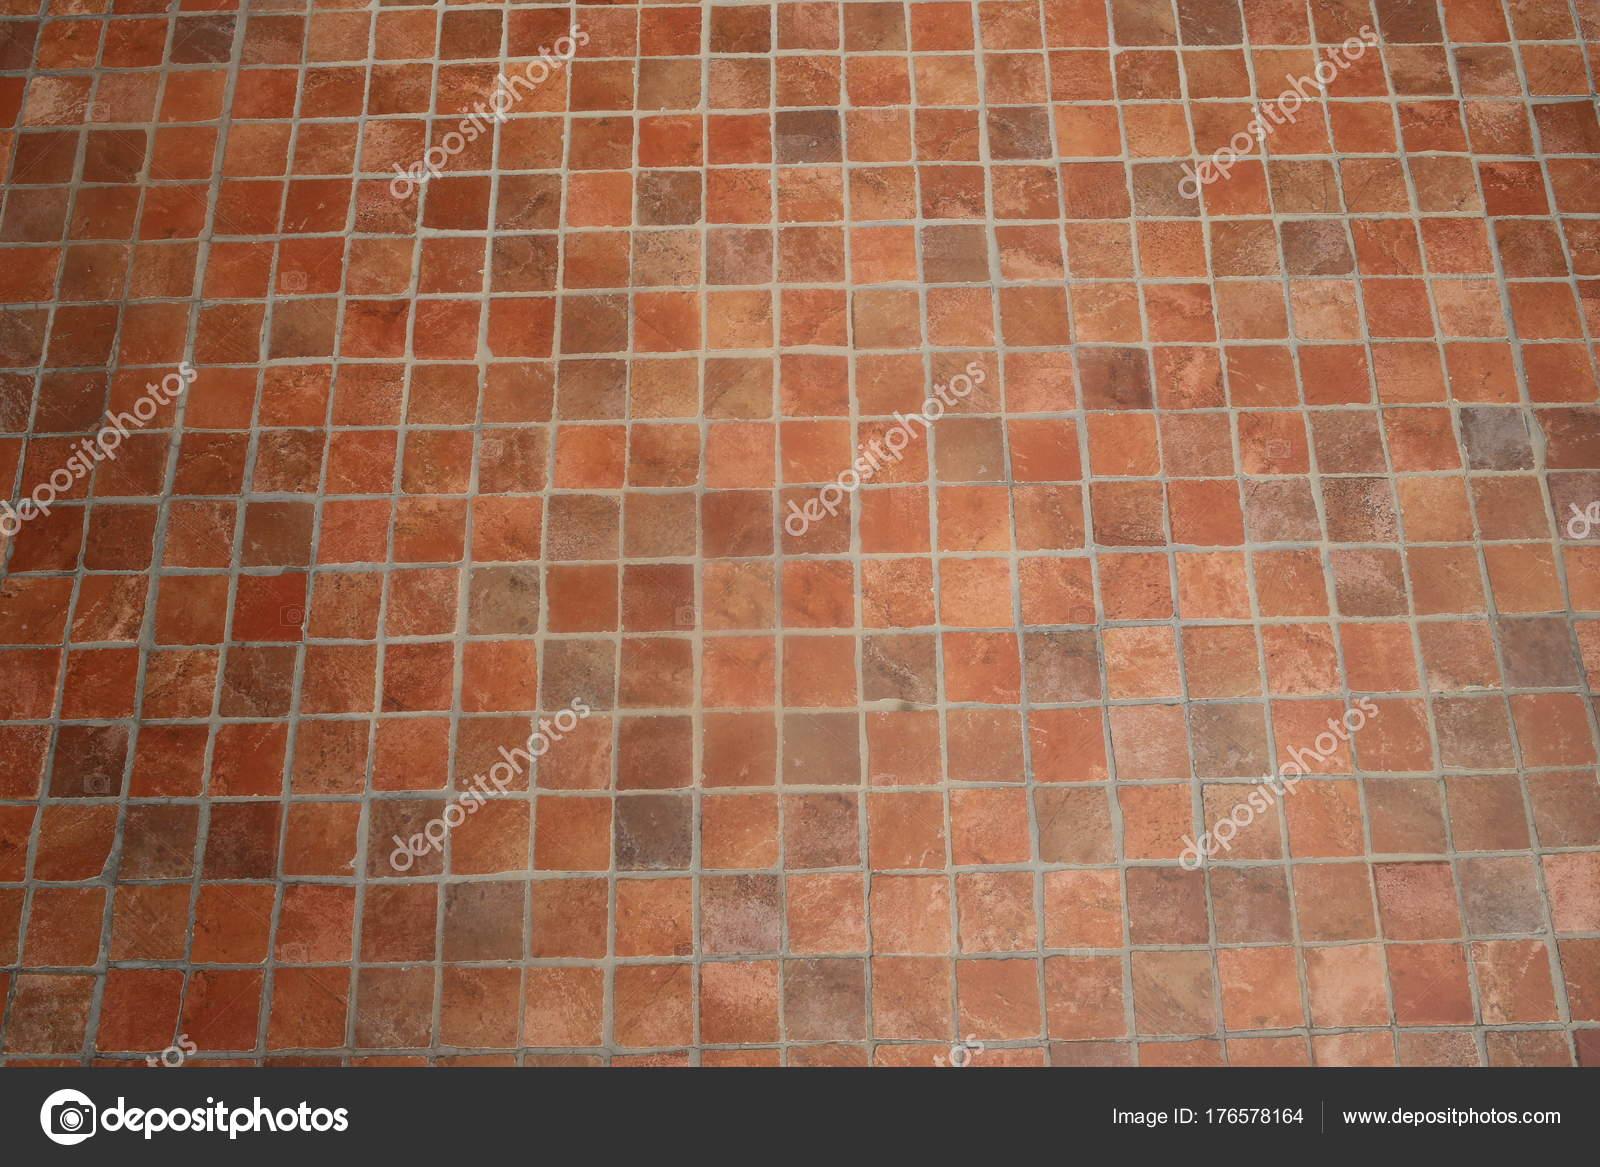 Struttura delle mattonelle rosse u foto stock kazanovskyiphoto